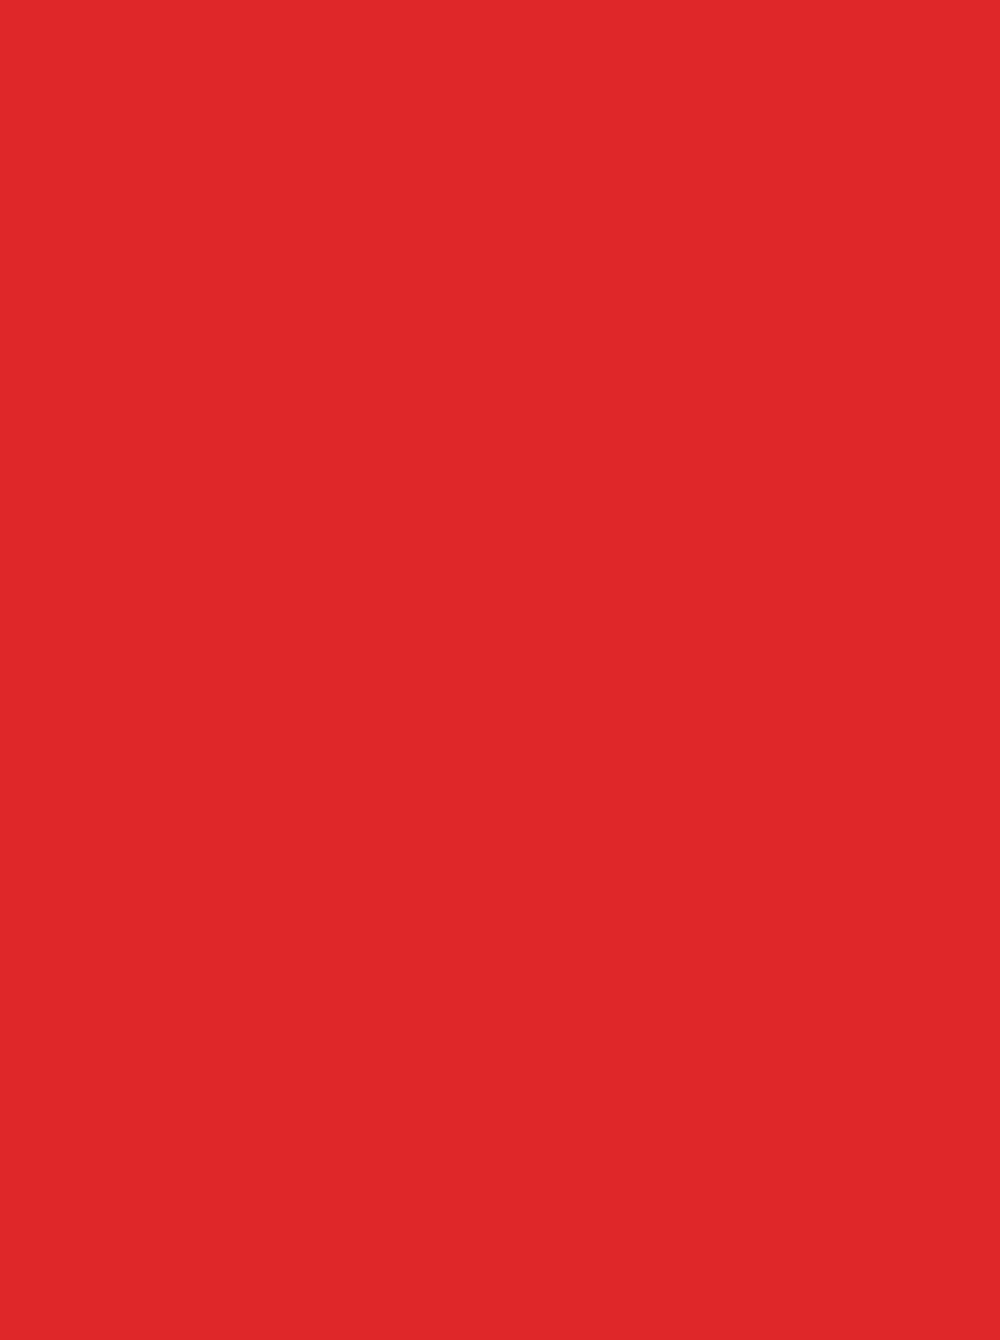 red spacer.jpg